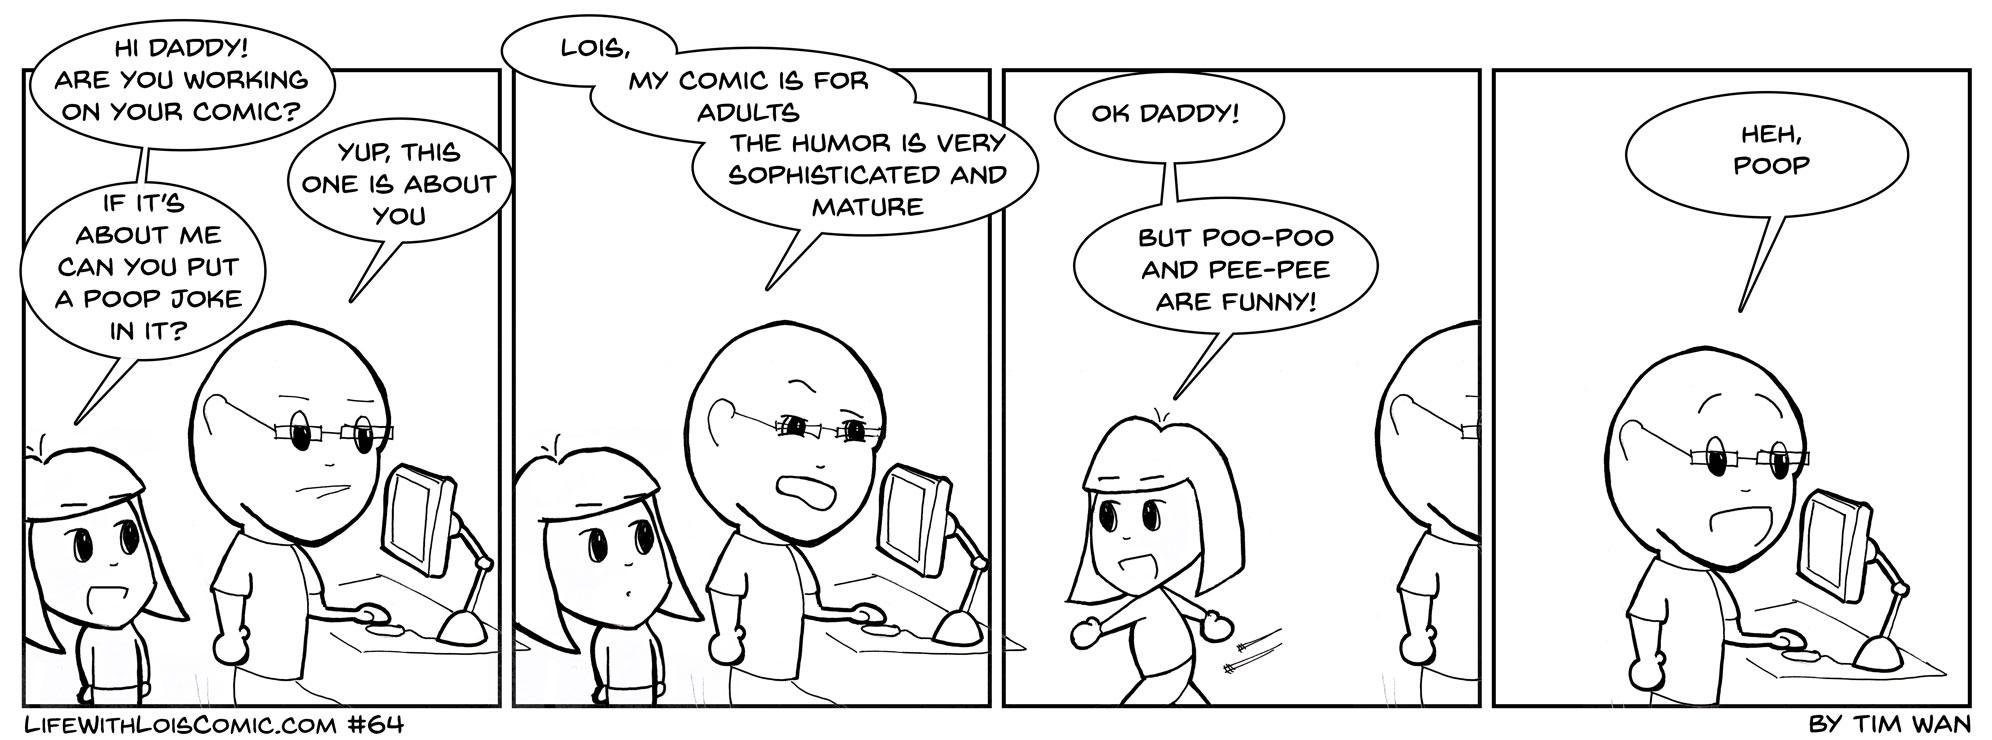 Mature Humor